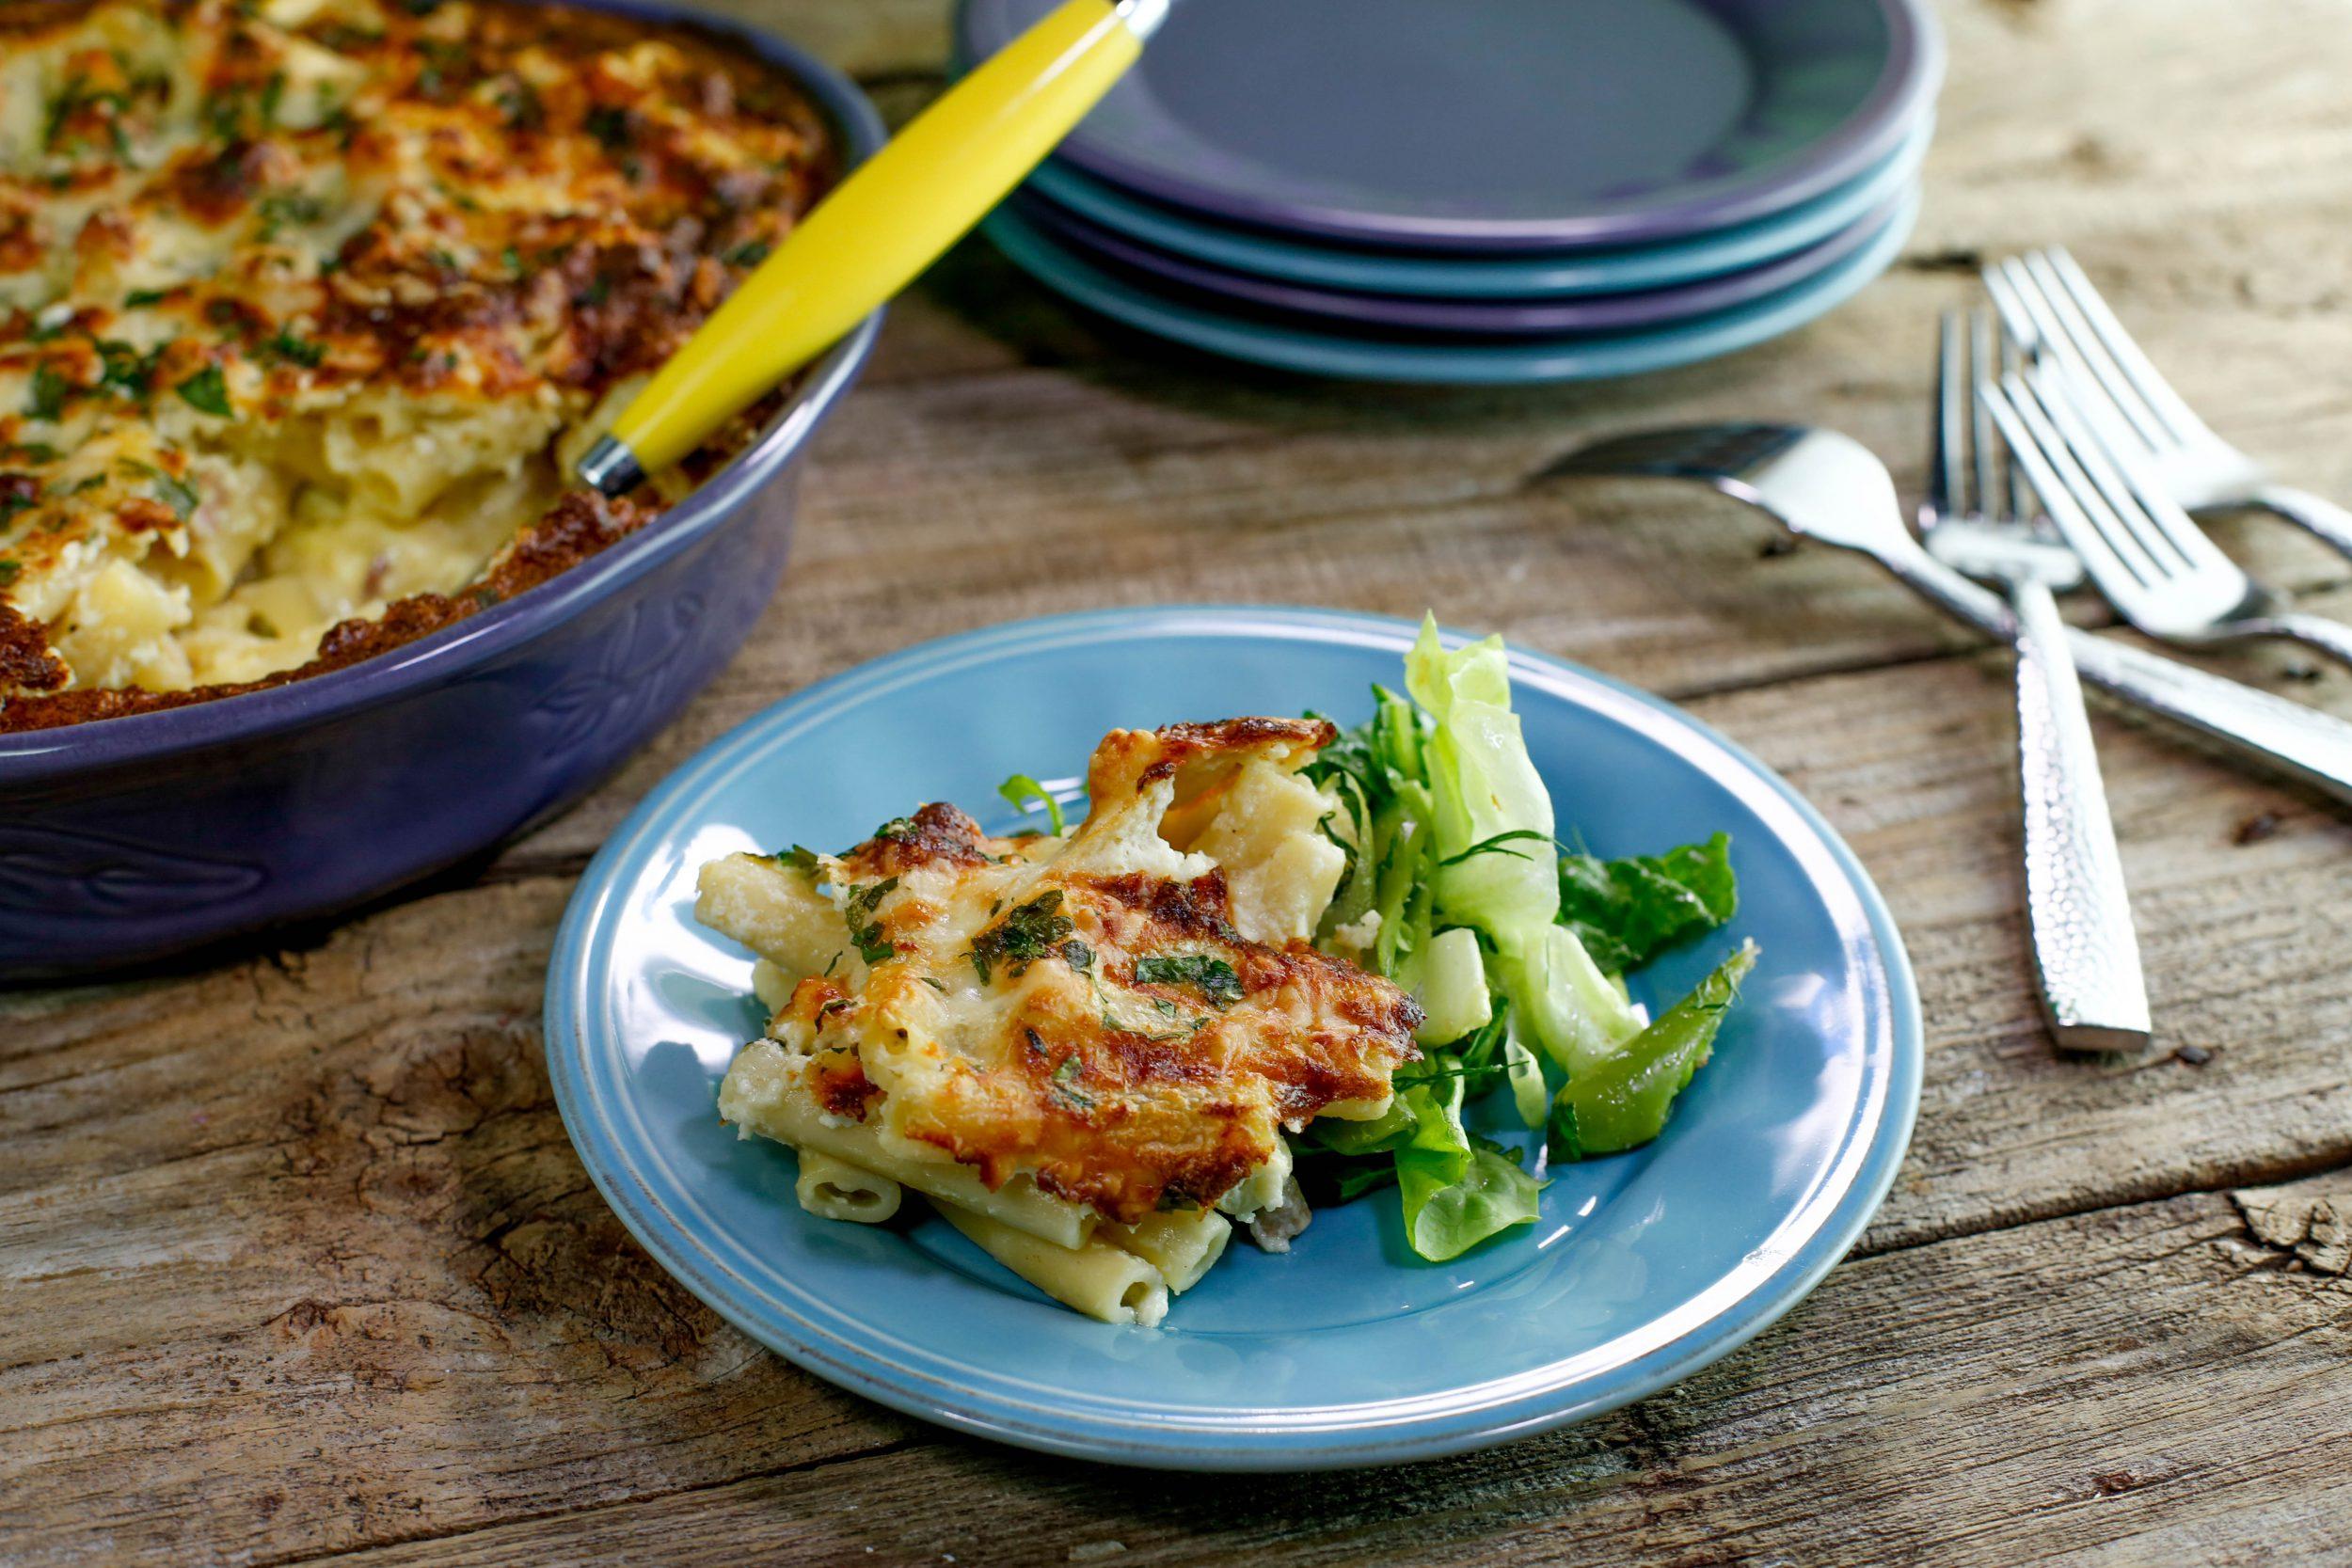 Carbonara Mac 'n Cheese Soufflé and Spring Salad